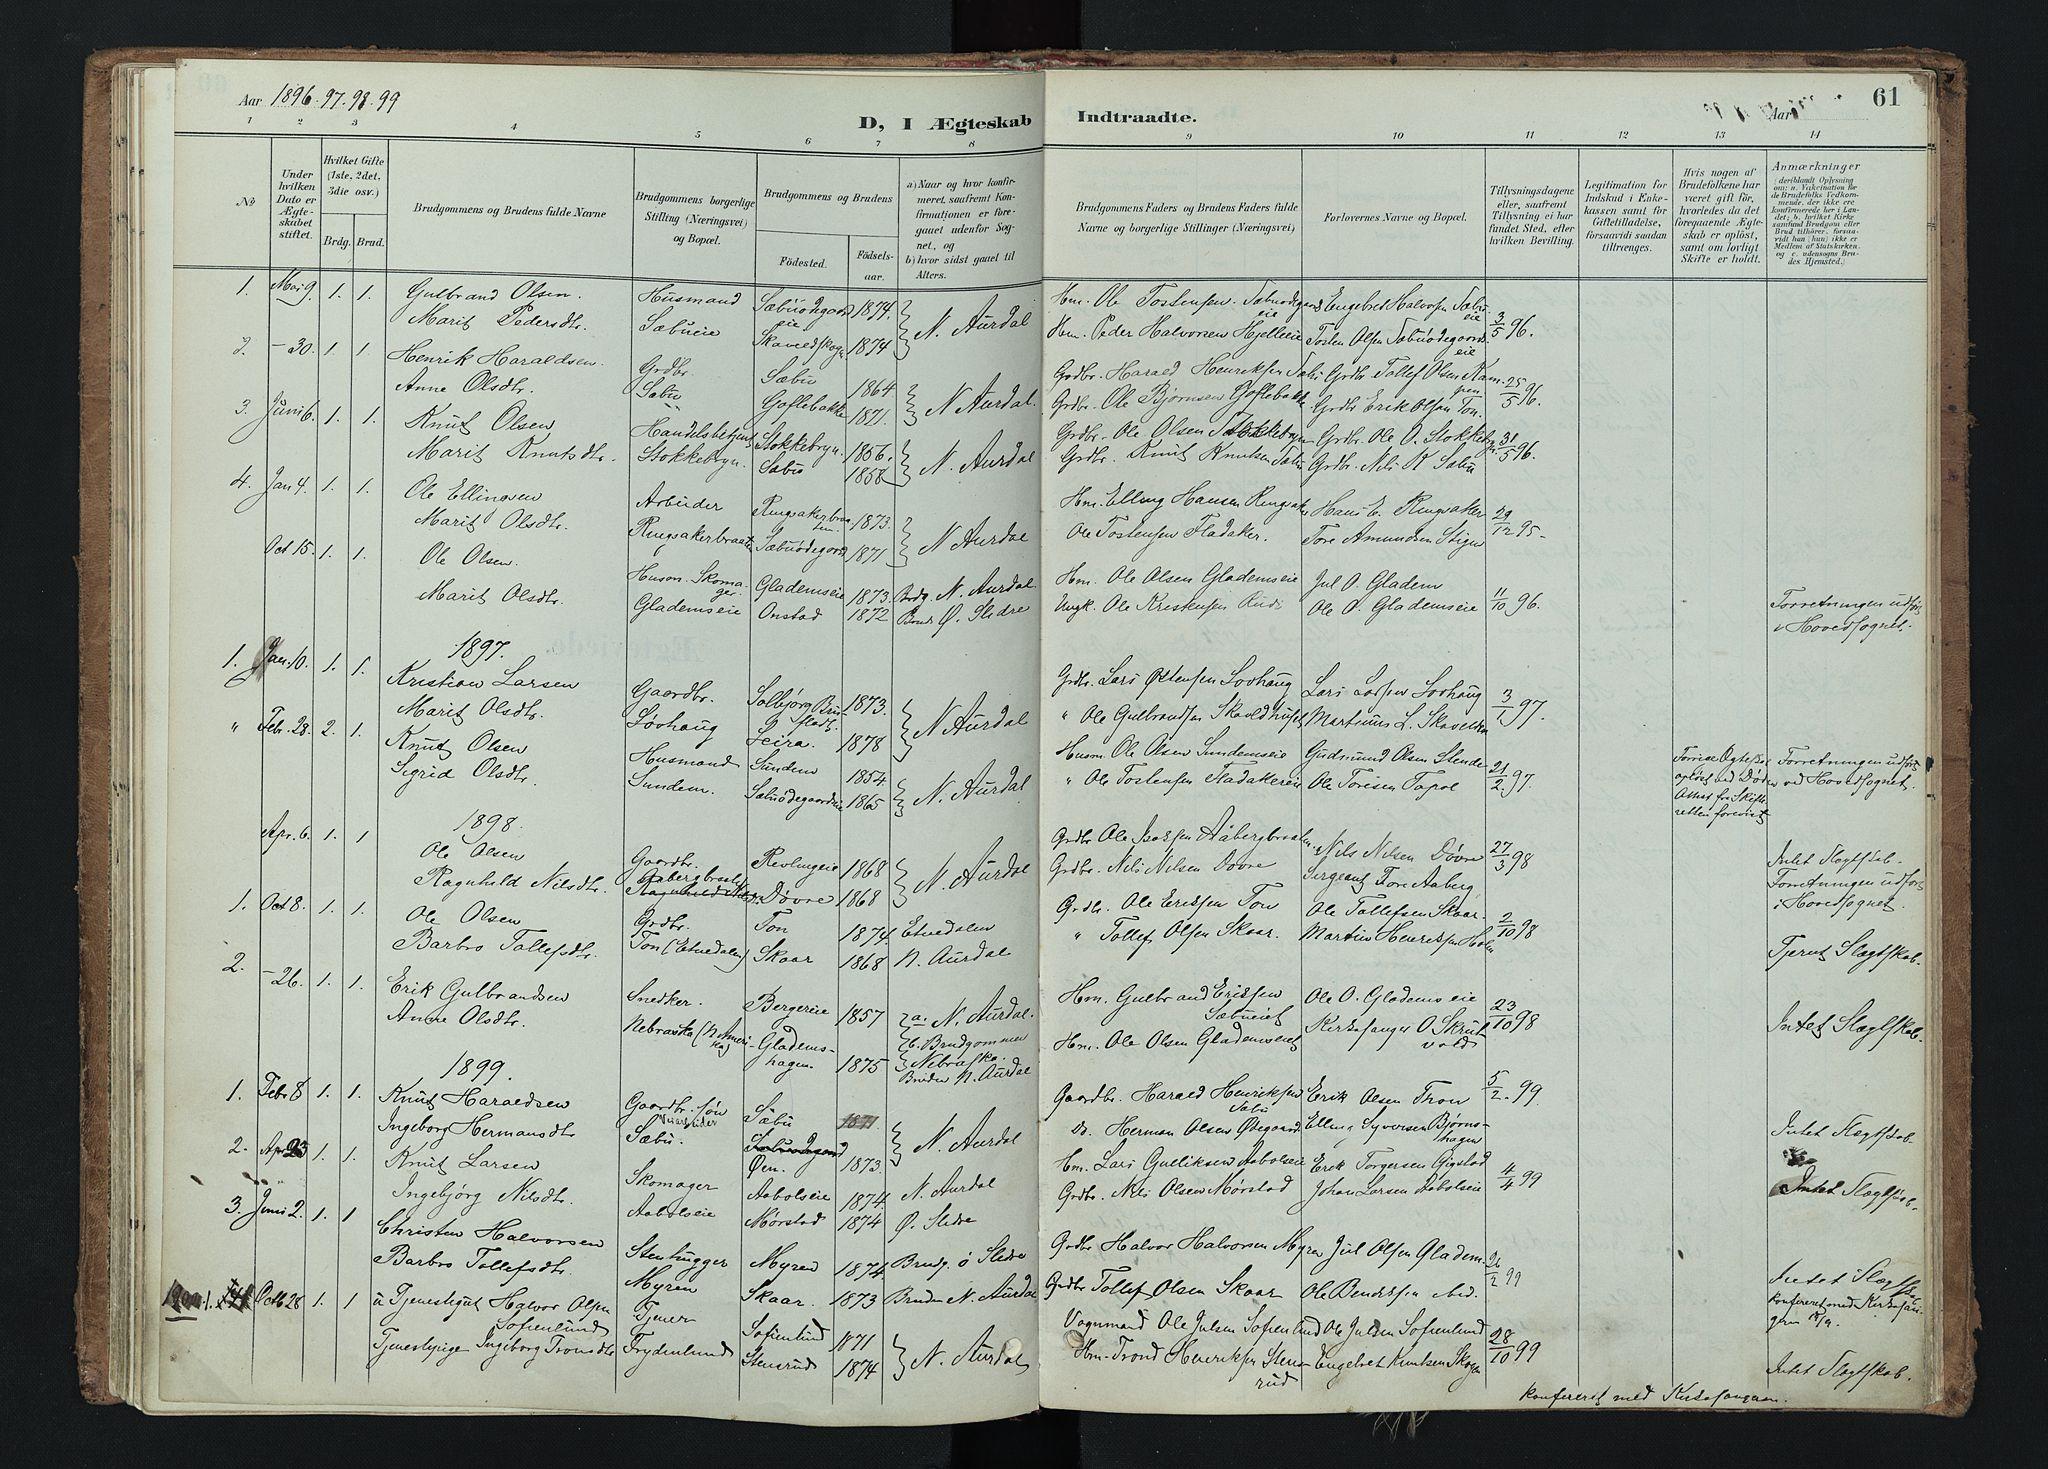 SAH, Nord-Aurdal prestekontor, Ministerialbok nr. 15, 1896-1914, s. 61